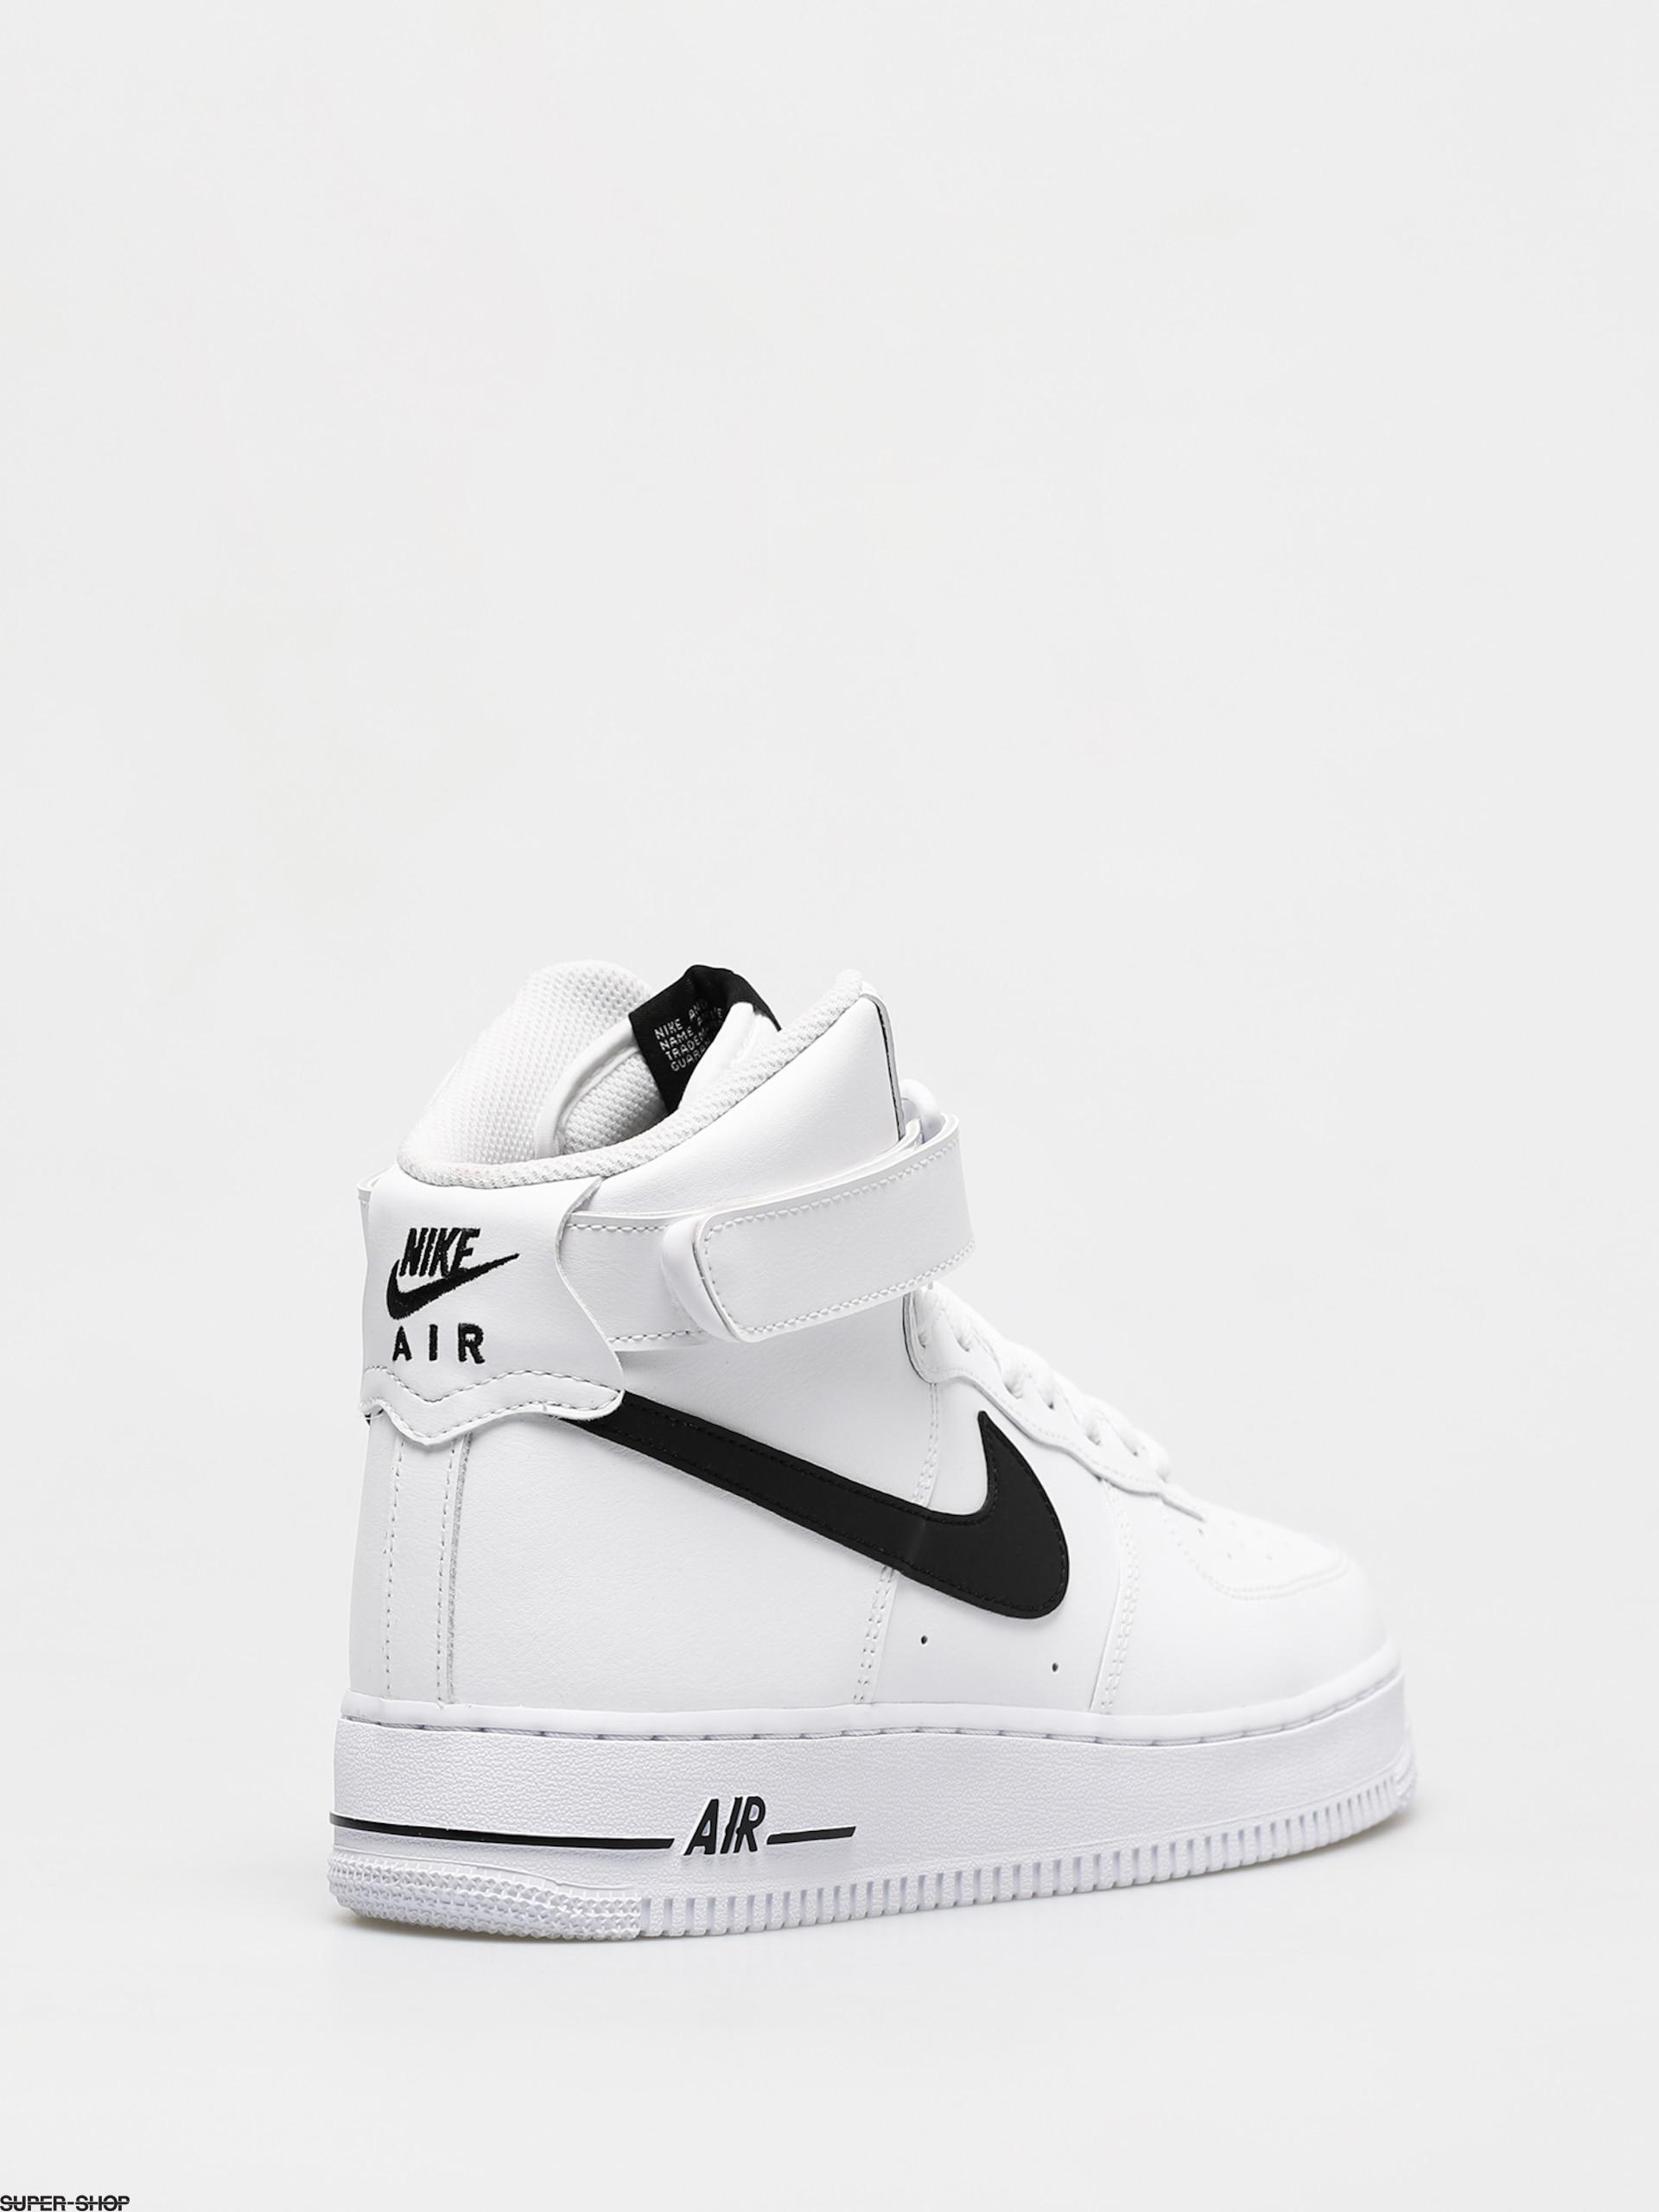 Nike Air Force 1 High 07 shoes white